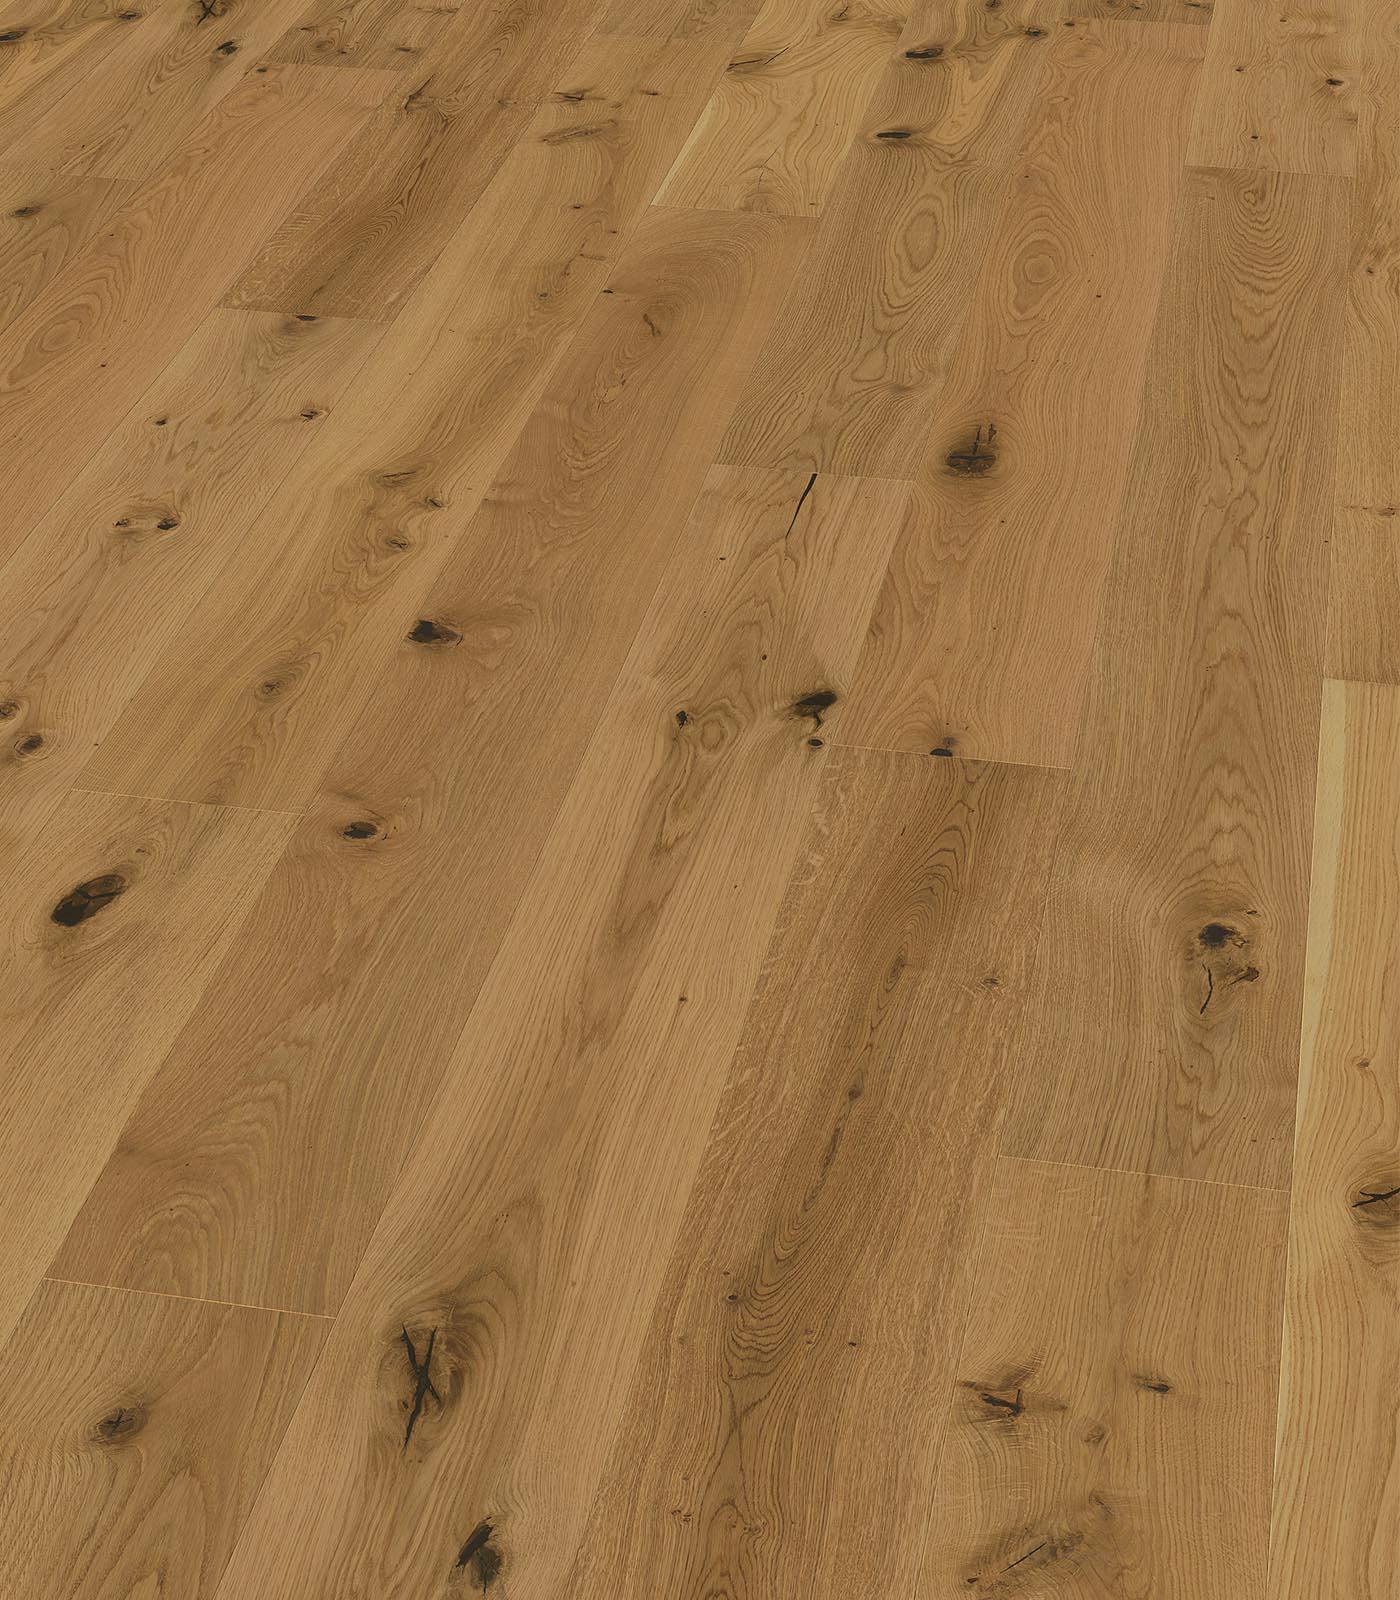 Oak Antique- Antique-grading-of-European-Oak-floors-Forestry-Timber-angle